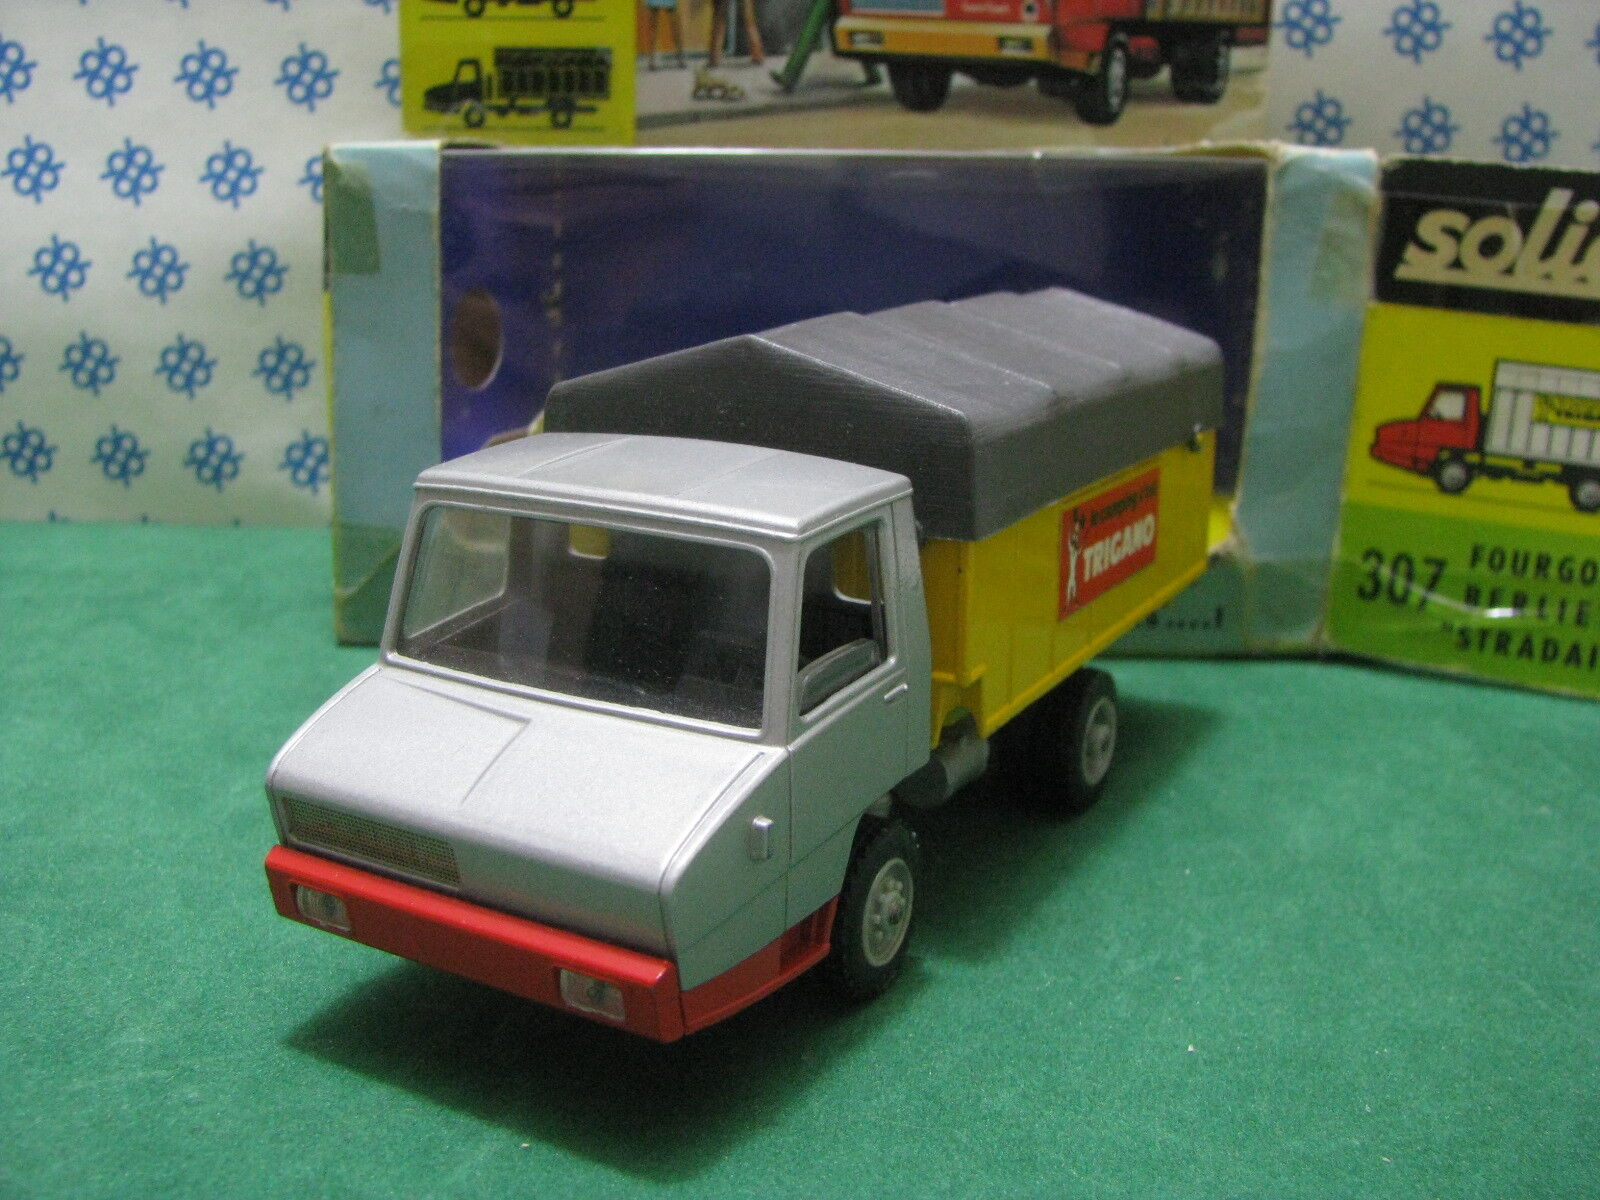 Estremely Rare - FOURGON BERLIET   Stradair   - 1 50 Solido Ref. 307 MIB